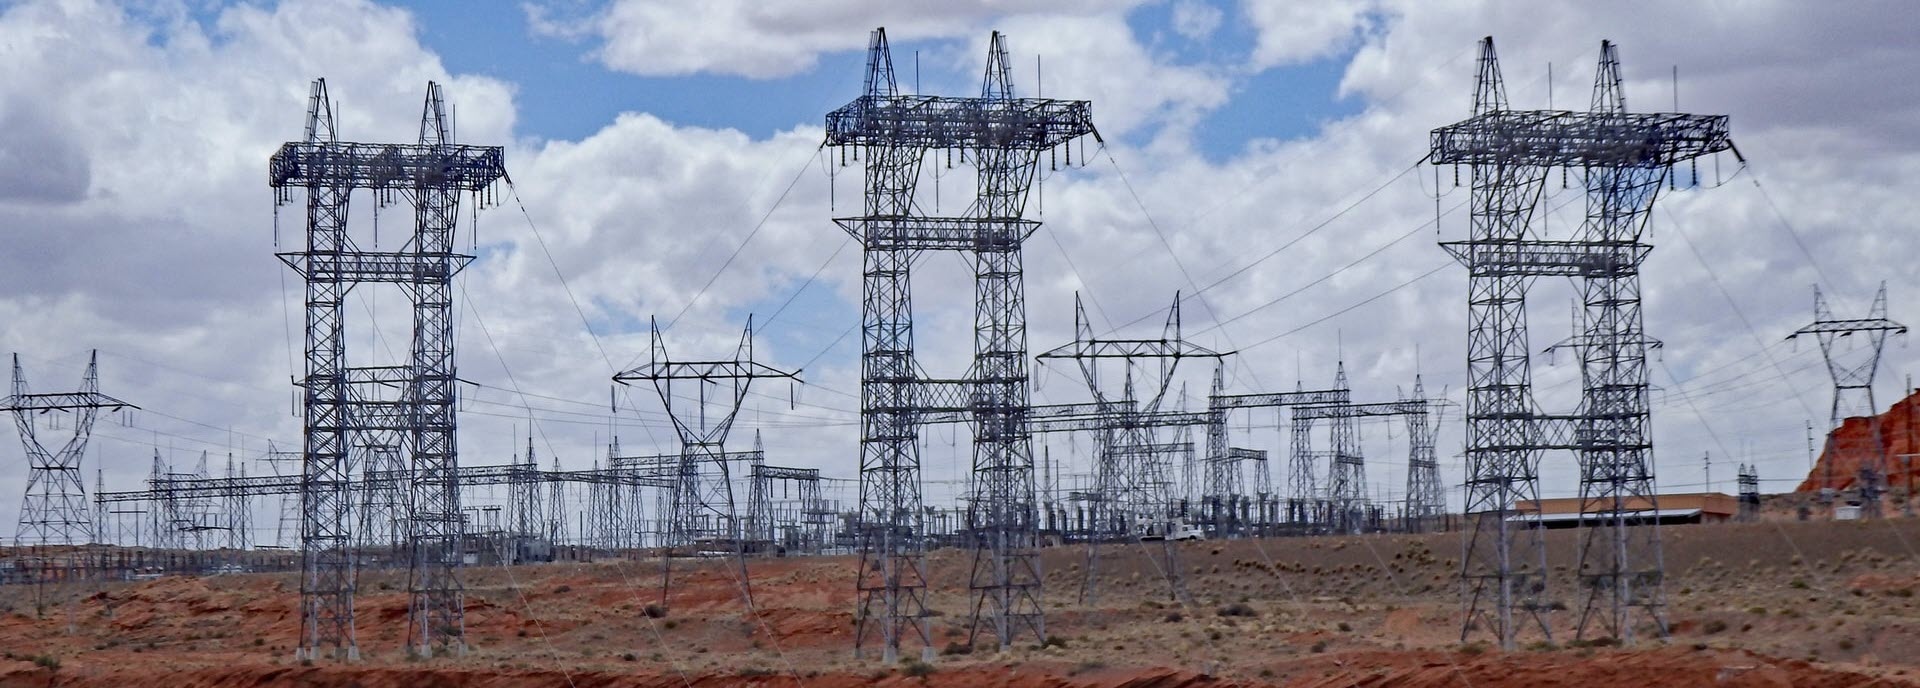 Power Lines Hero-unsplash